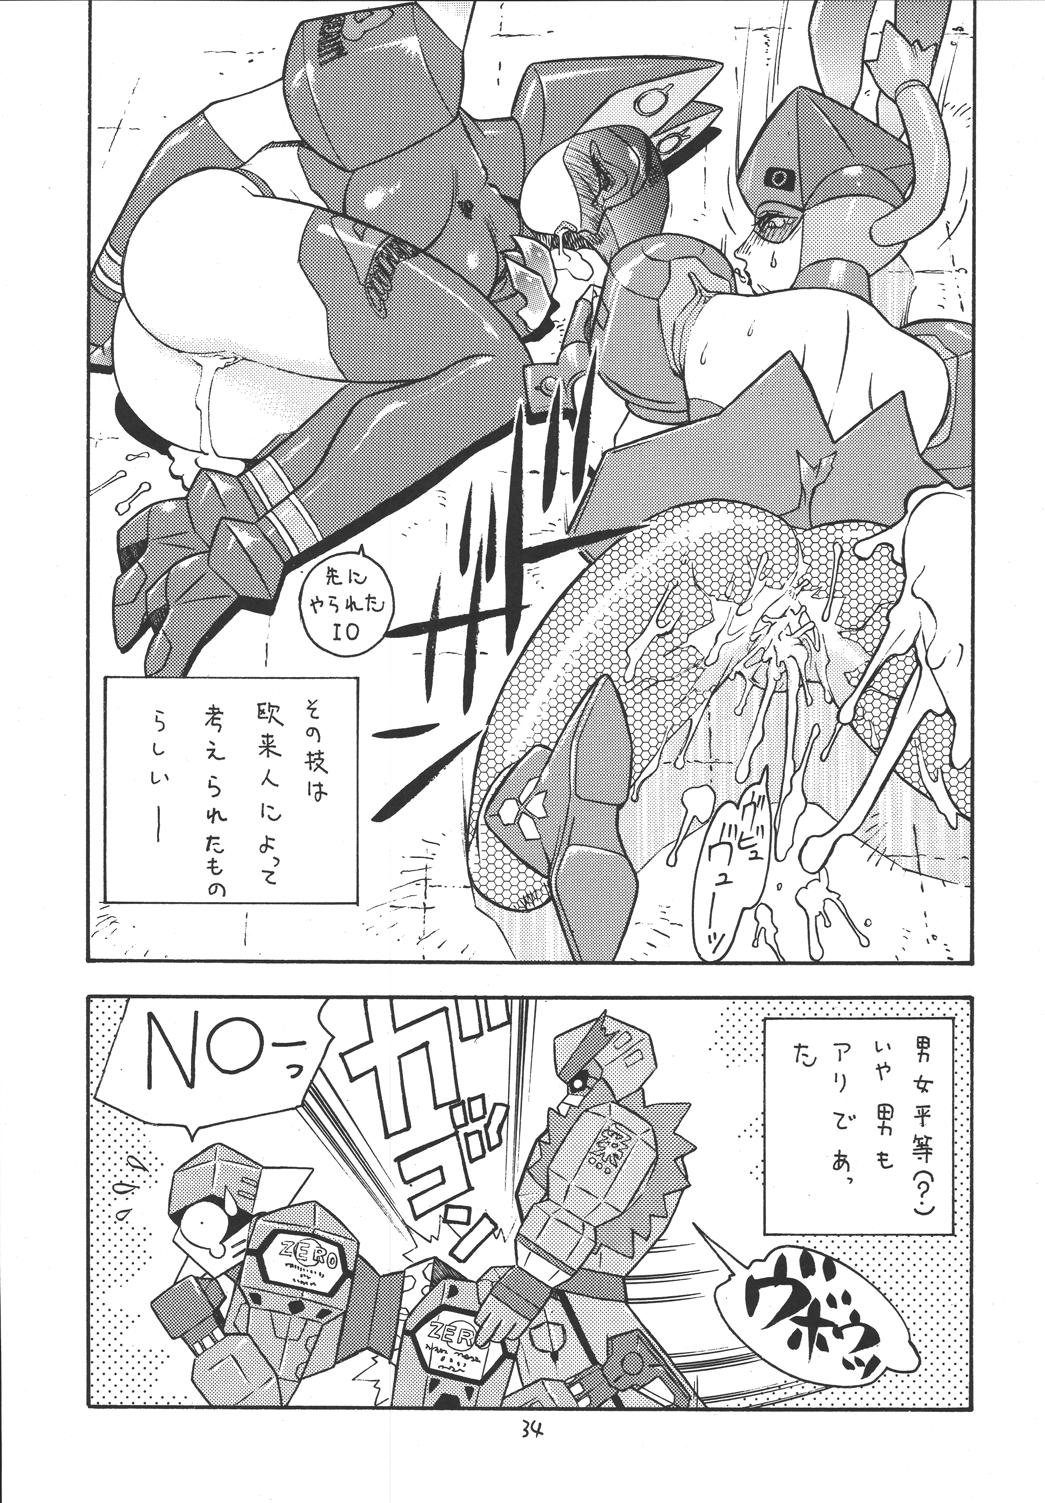 Fighters Giga Comics Round 1 32